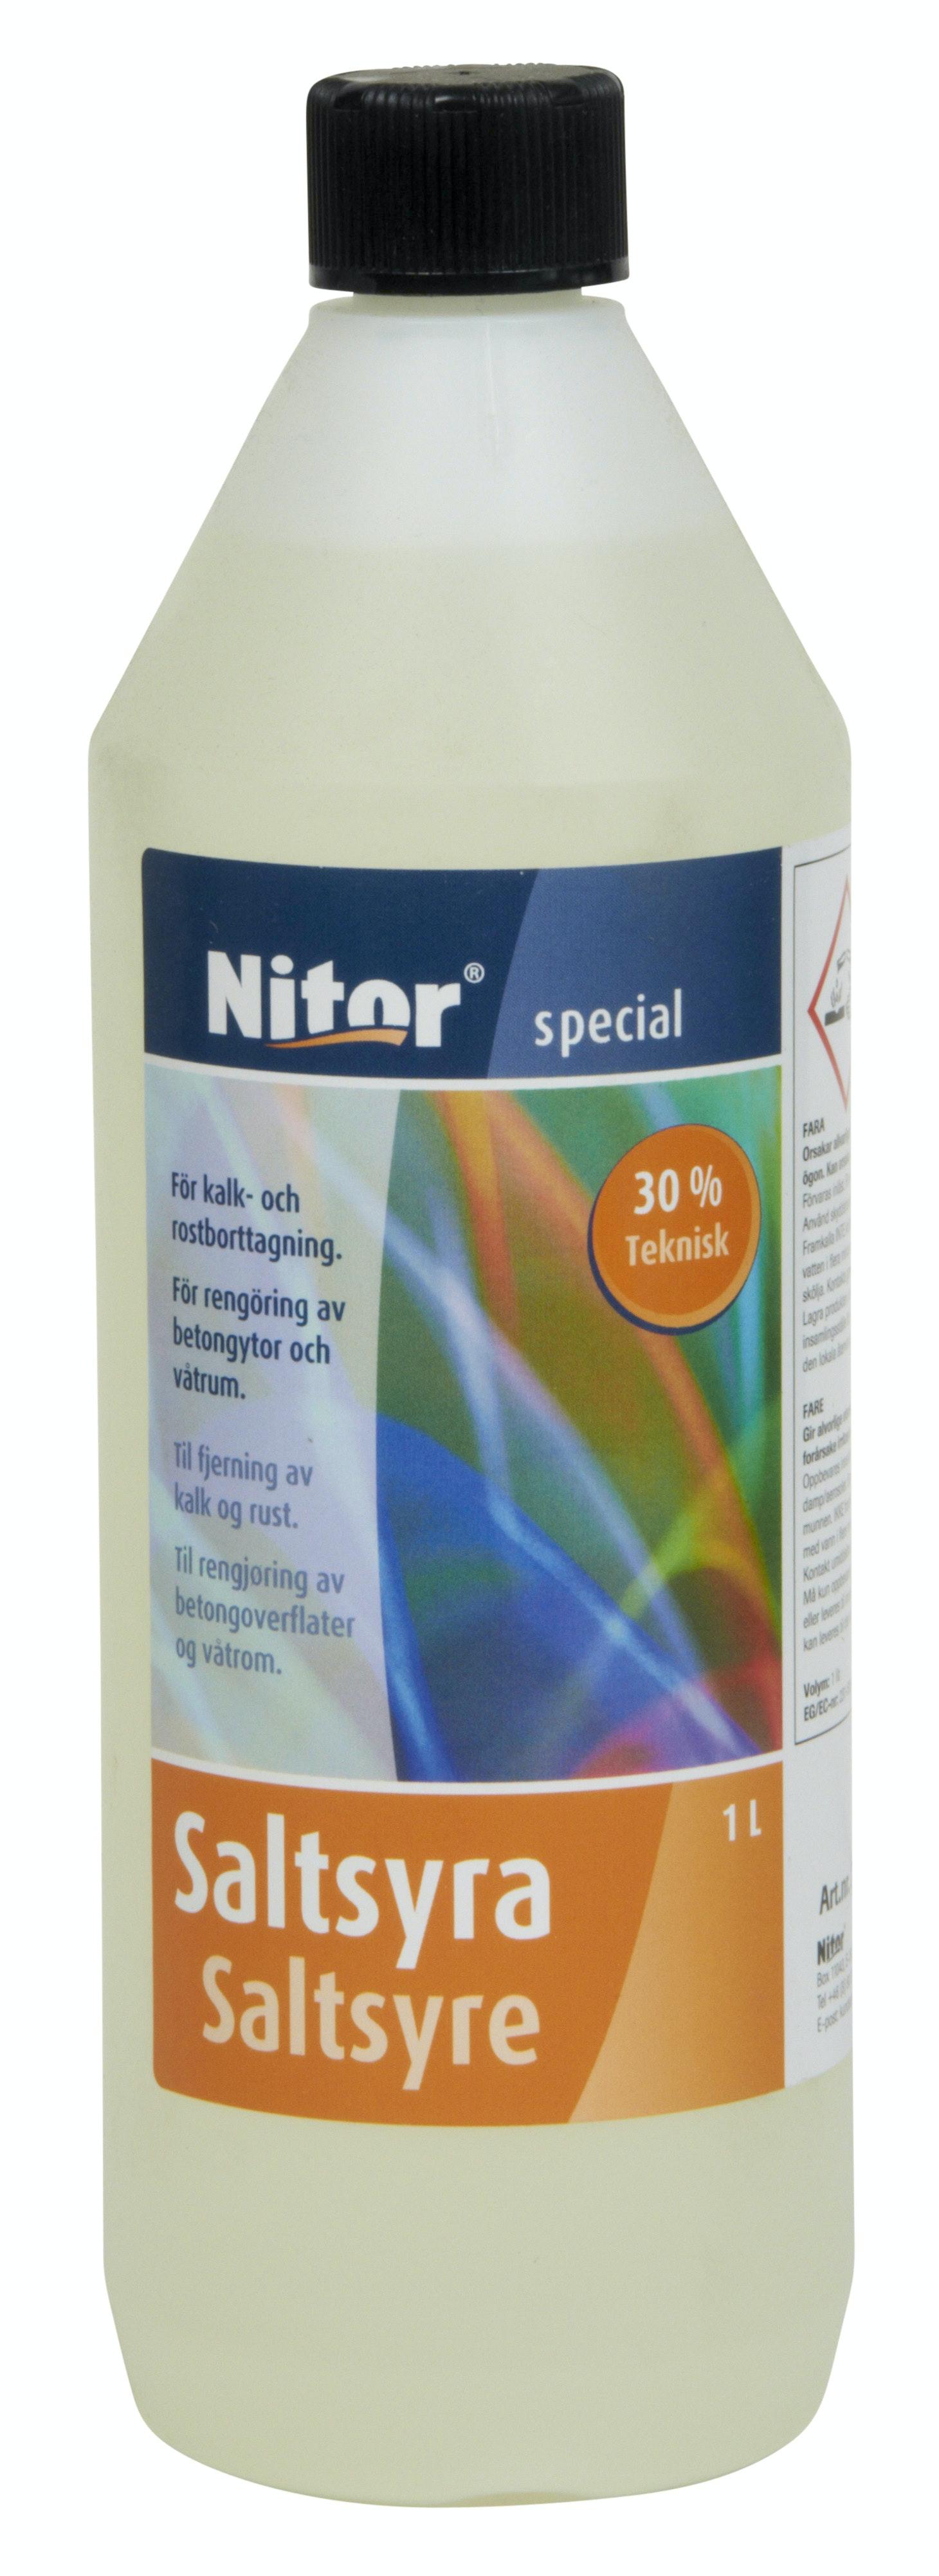 Saltsyra Nitor 0,3 Teknisk 5l